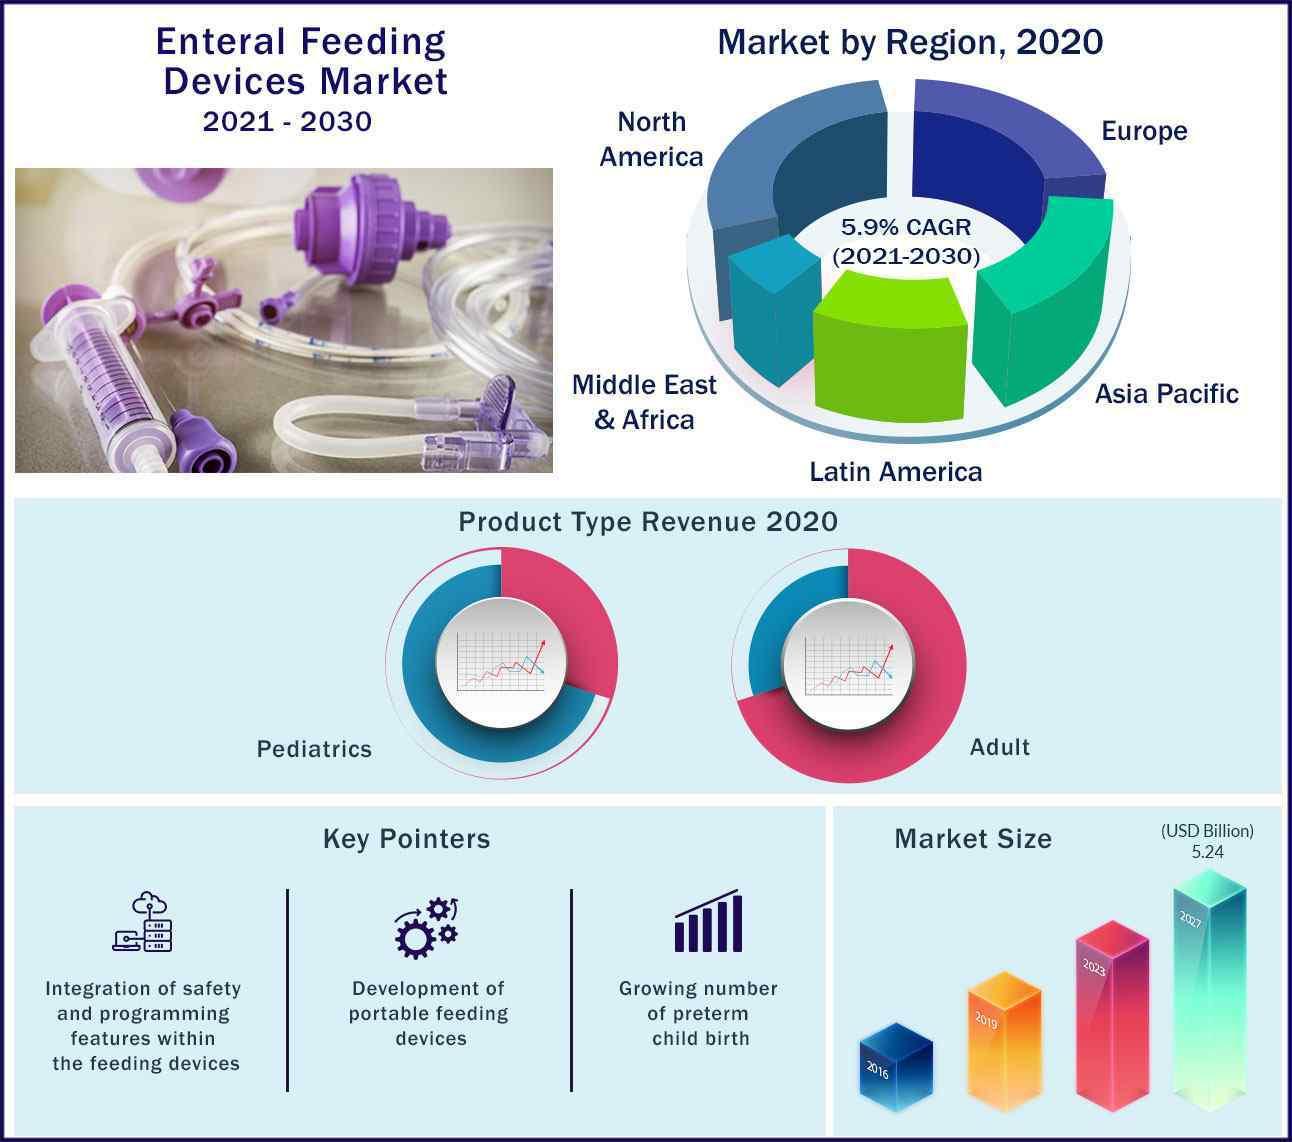 Global Enteral Feeding Devices Market 2021-2030